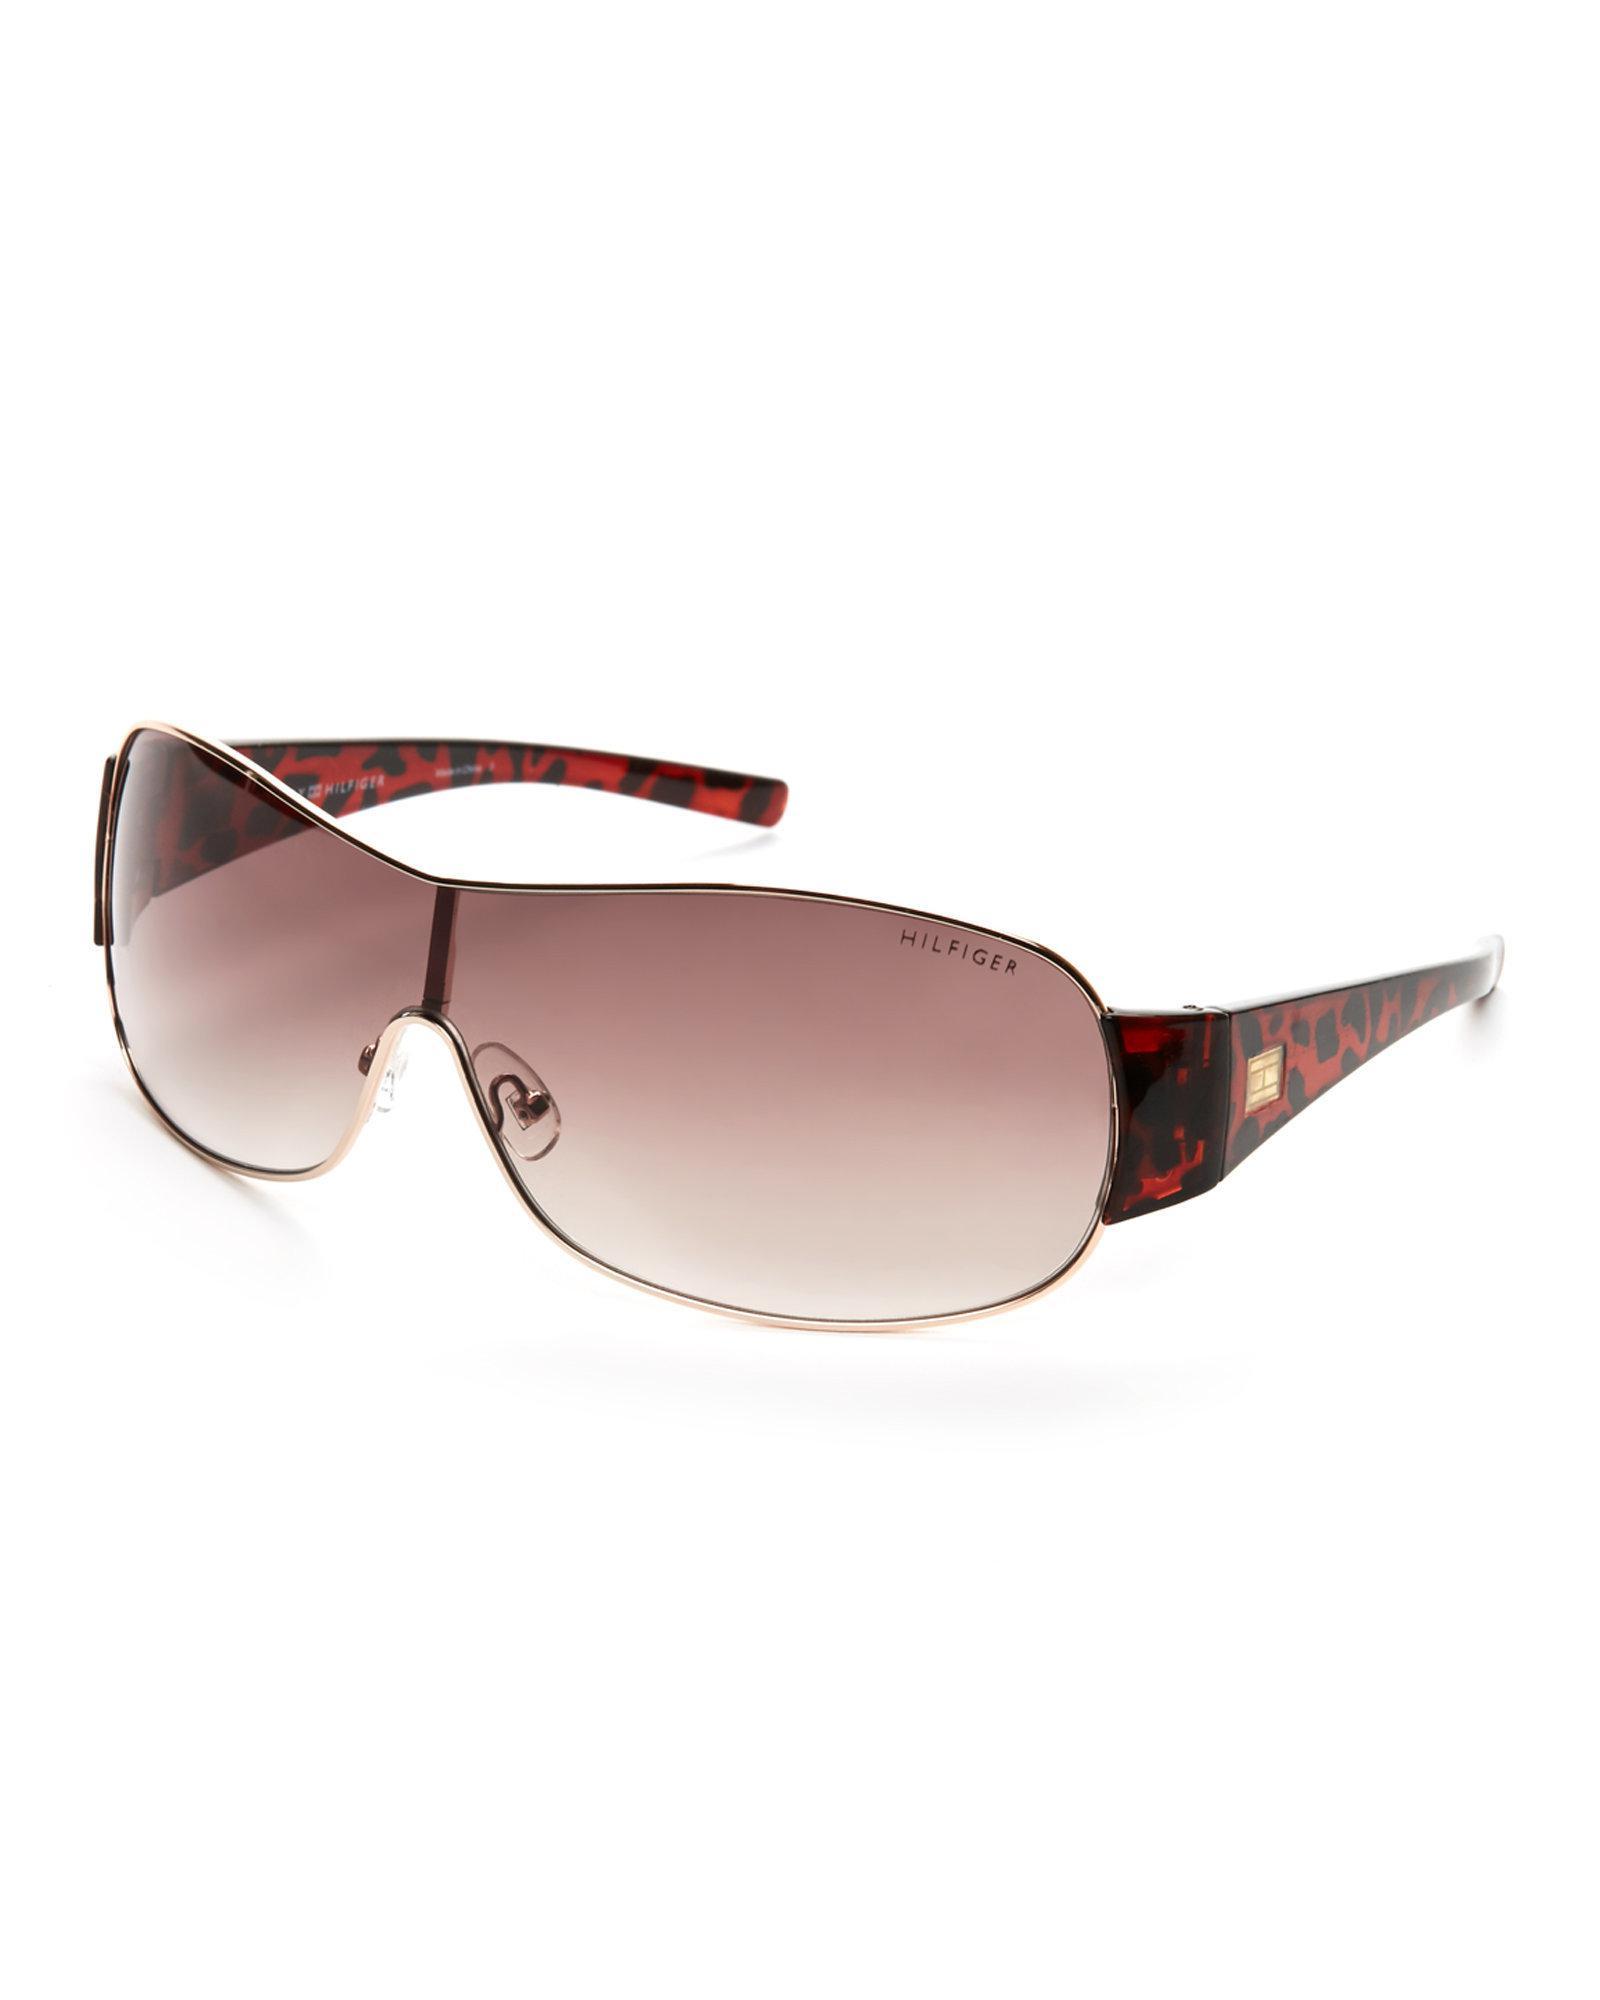 e0975b2c837 Lyst - Tommy Hilfiger Gold   Tortoiseshell-Look Donna Shield Sunglasses